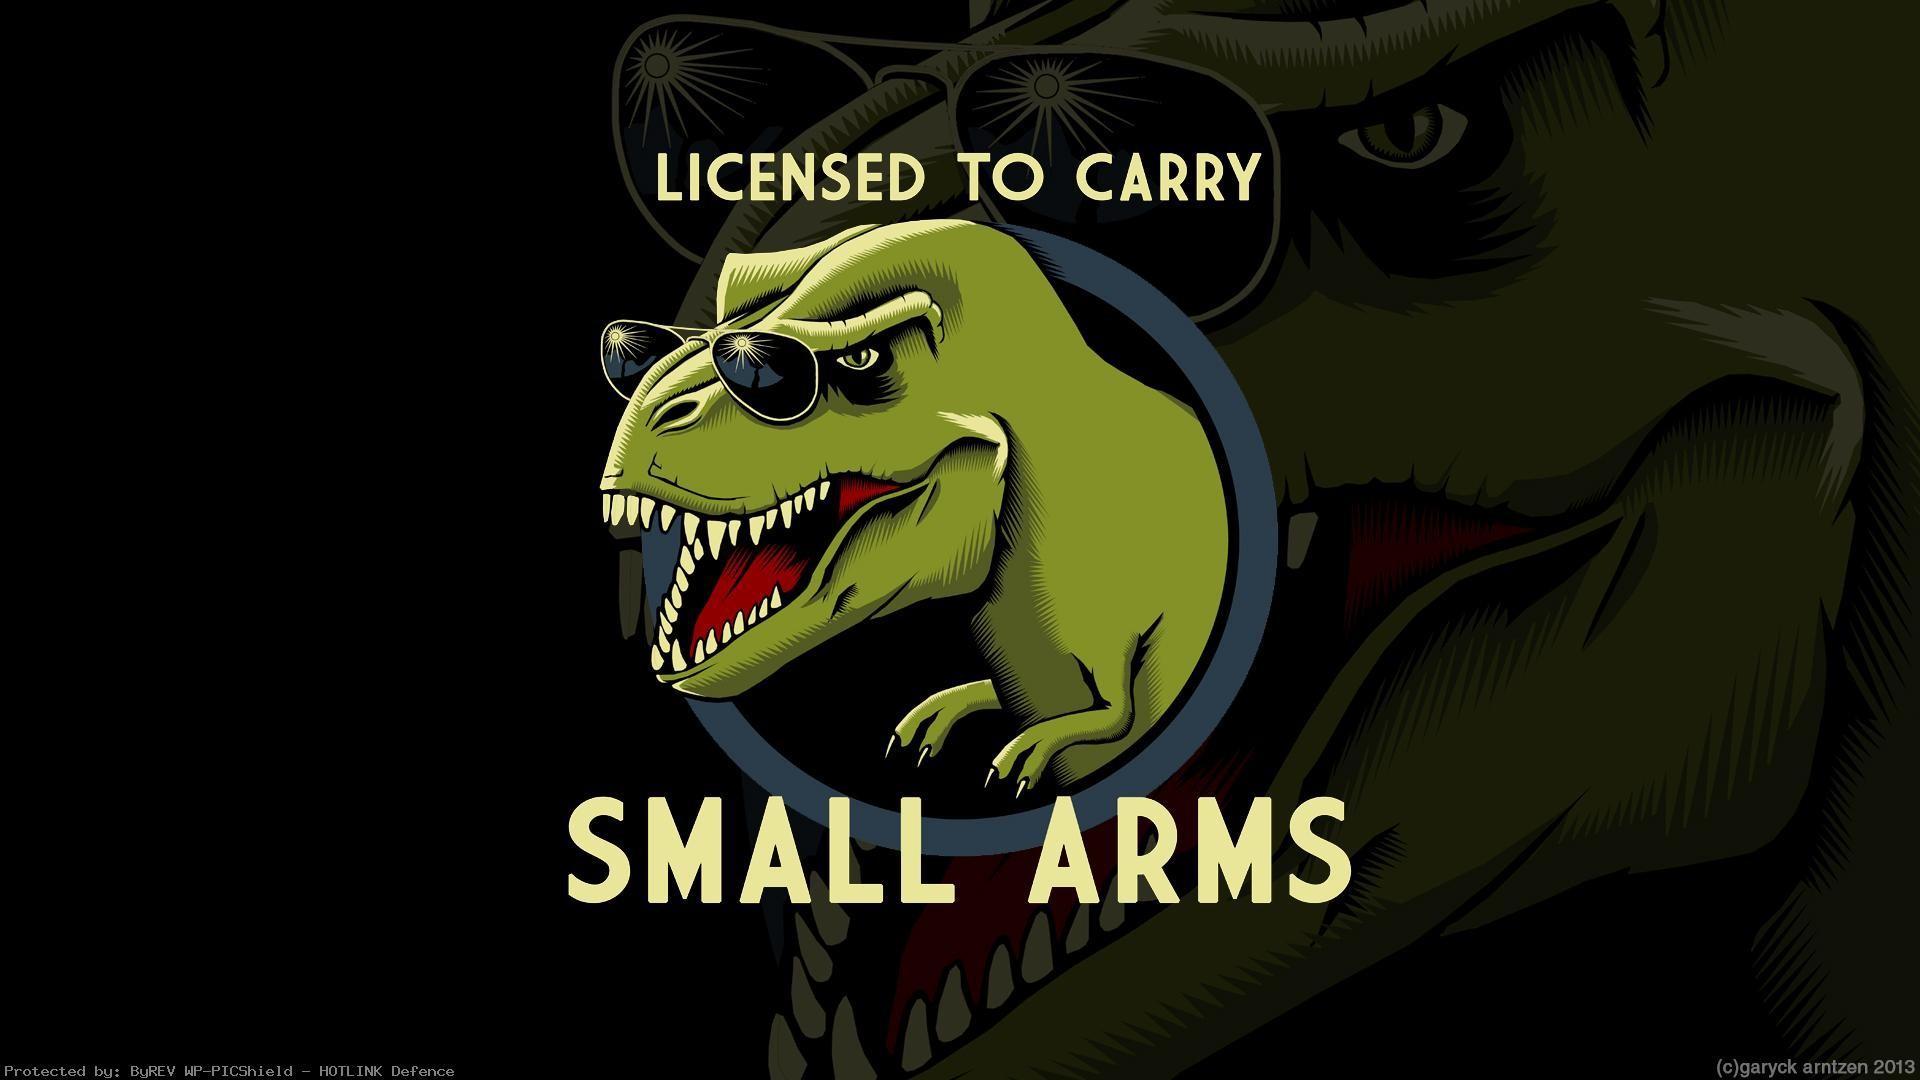 T-Rex-Small-Arms-Arms-Sunglasses-dinosaur-1920×1080-